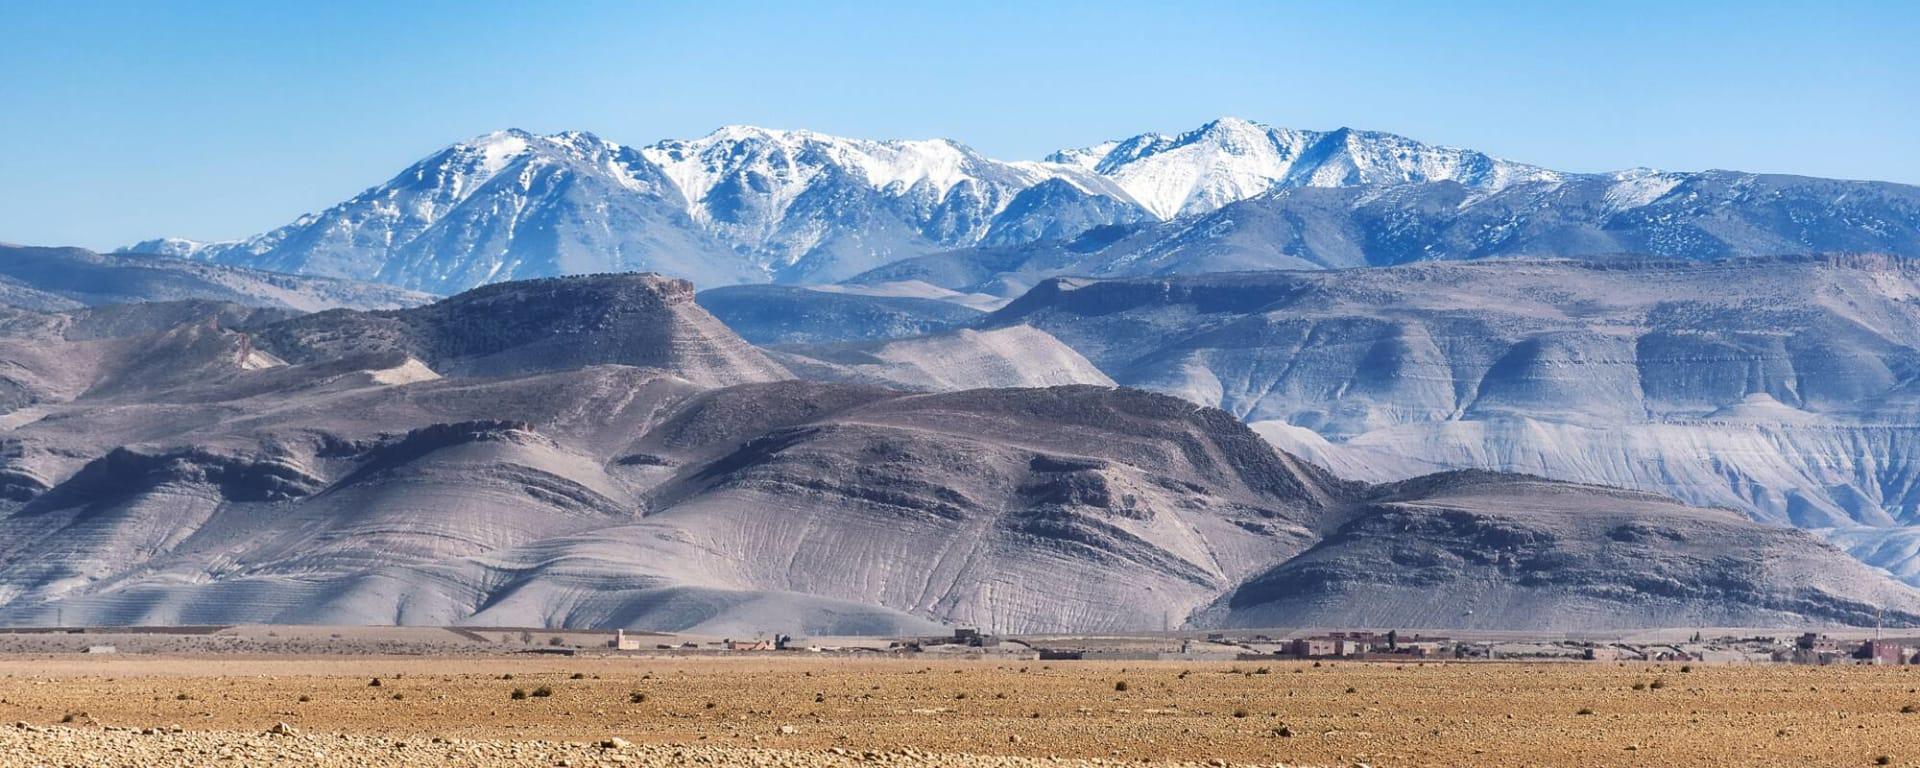 Marokko entdecken mit Tischler Reisen: Marokko Atlasgebirge Panorama